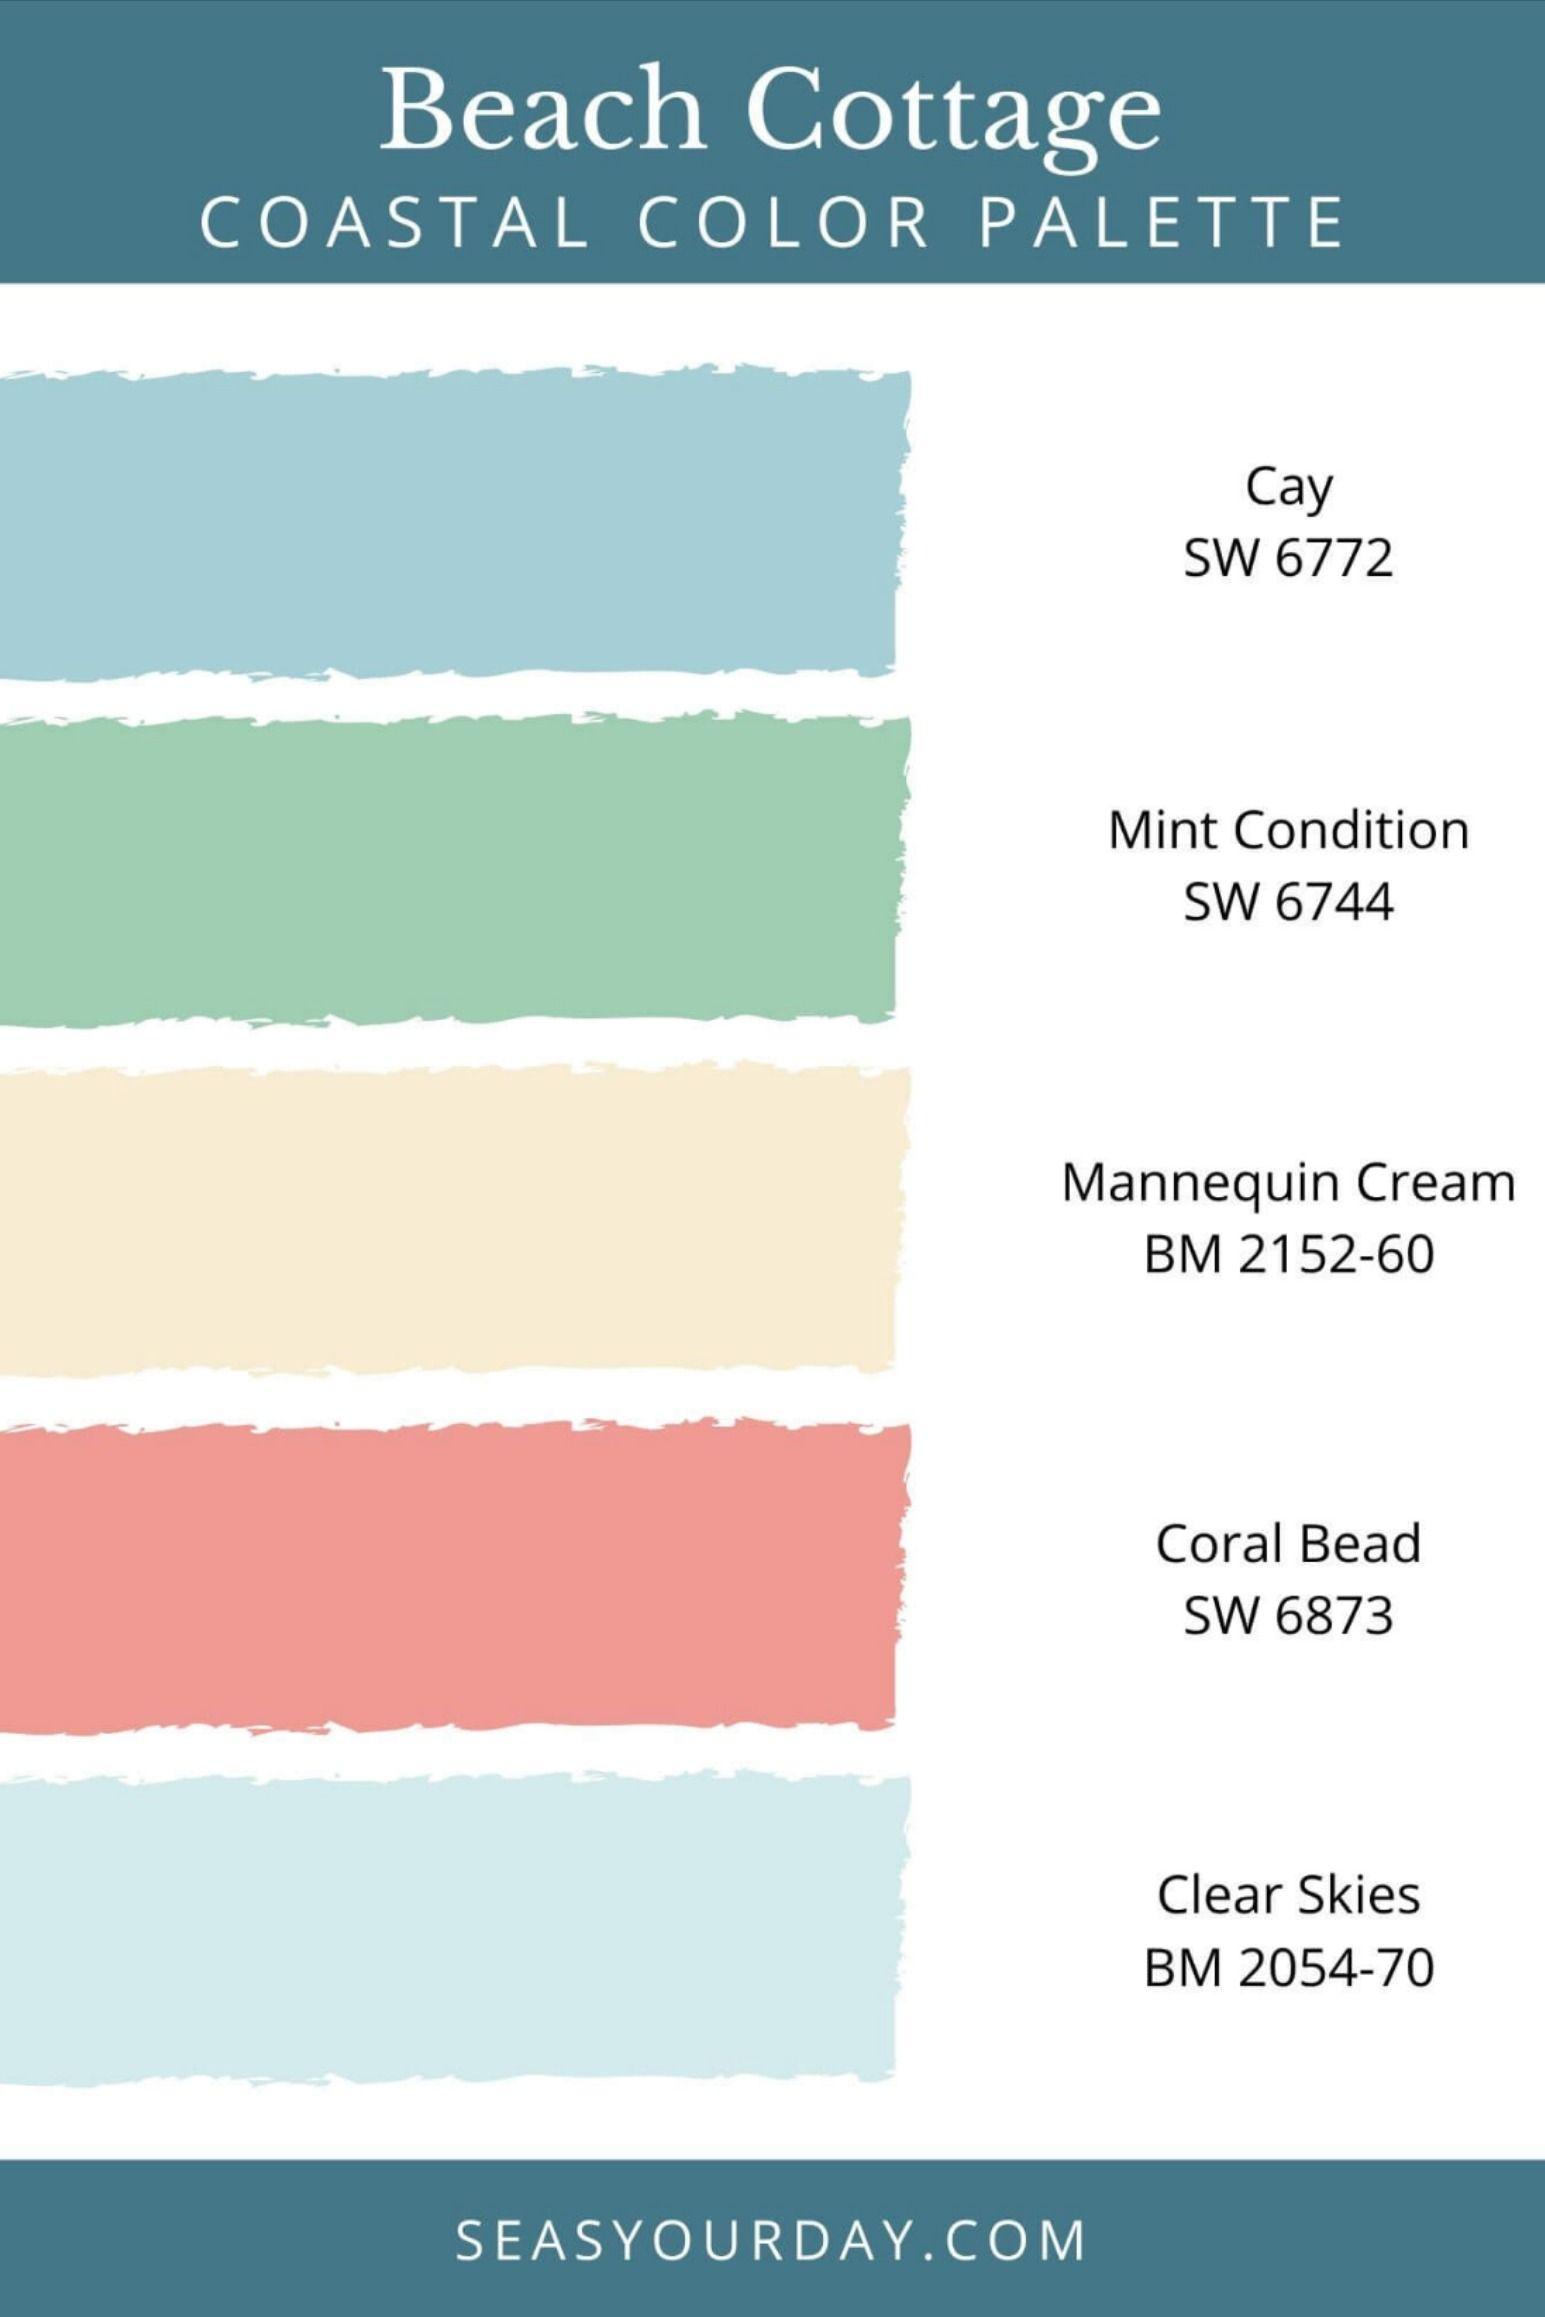 Beach Cottage Coastal Color Palette In 2020 Beach House Colors Beach Cottage Style Coastal Color Palettes